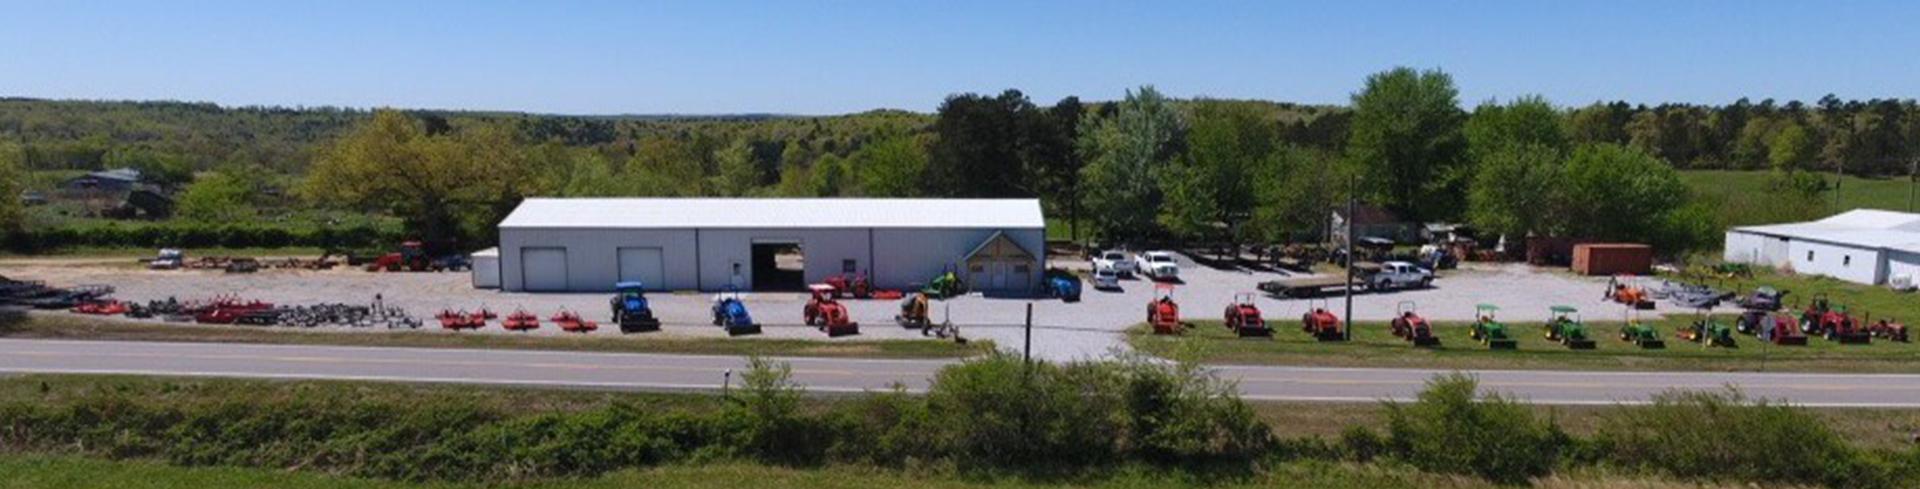 Used Trucks For Sale In Arkansas >> Miller Equipment Truck Sales Llc Concord Ar Buy Sell